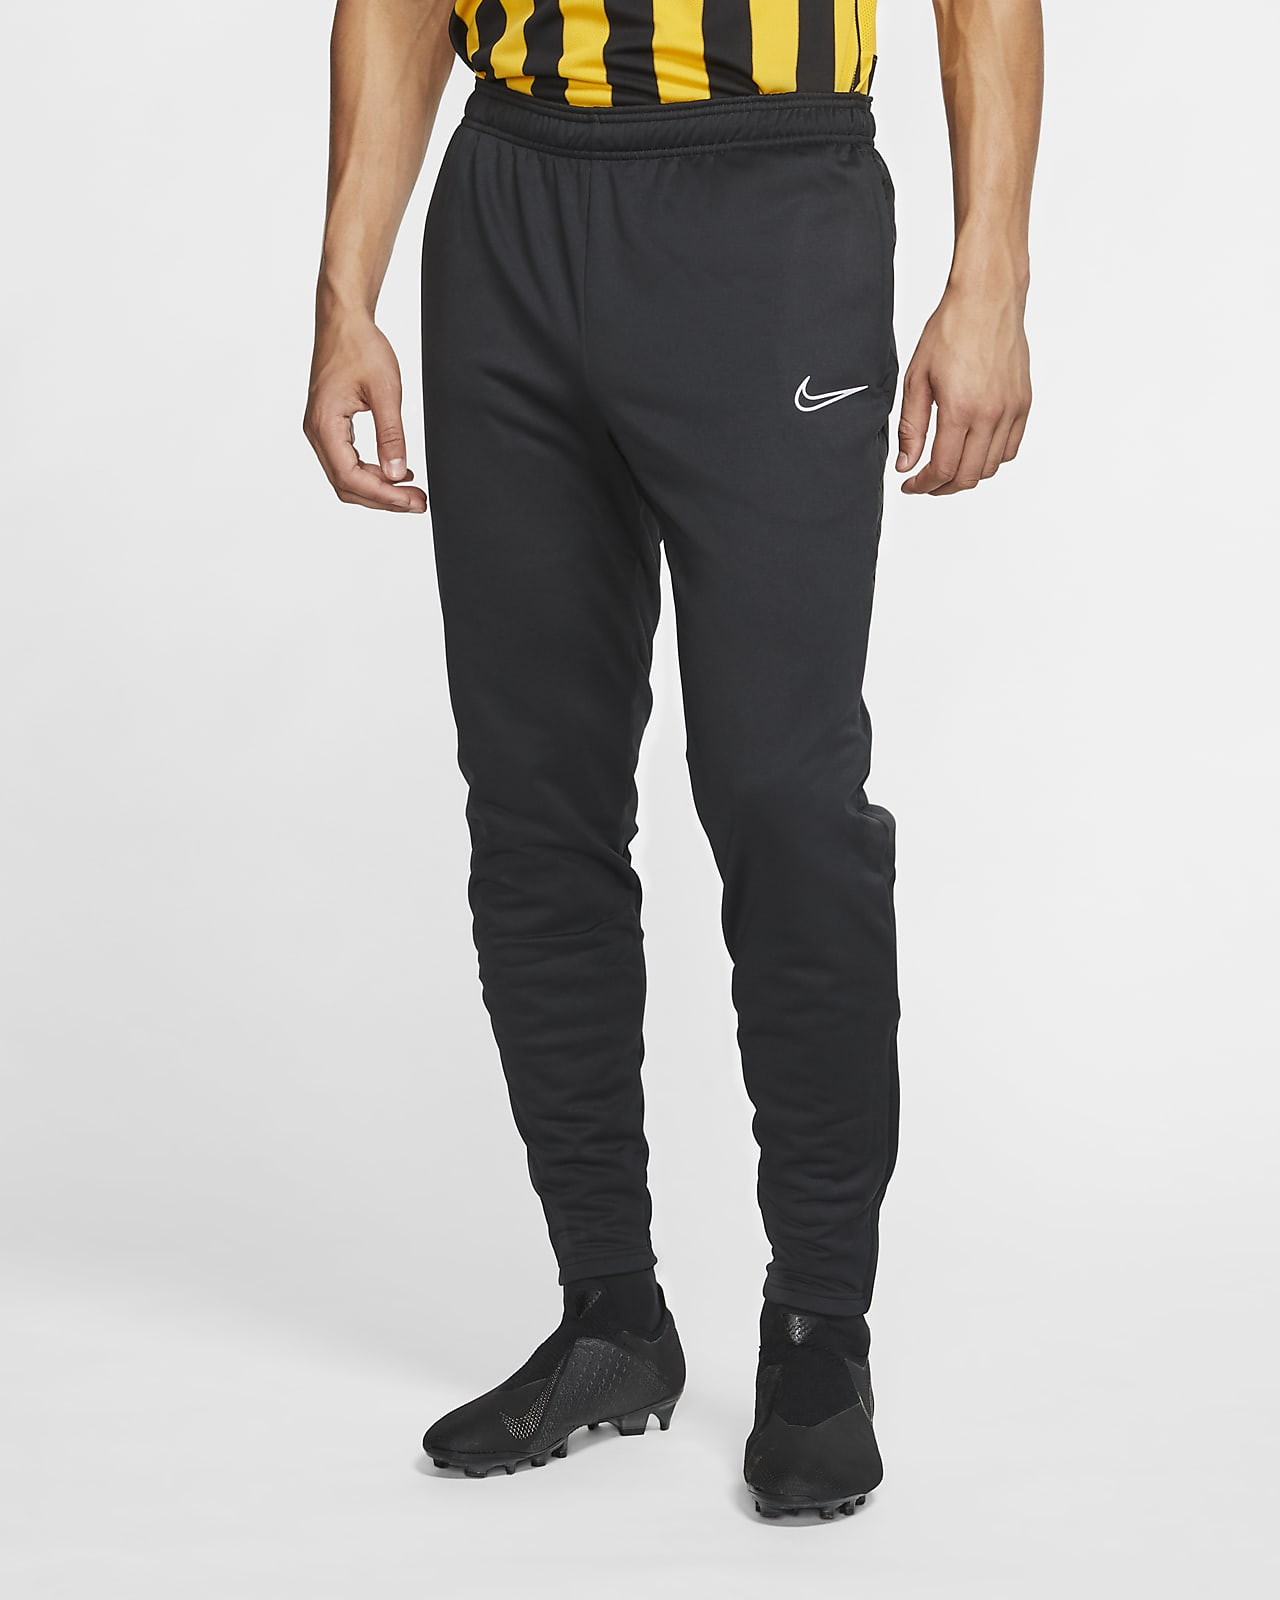 Nike Therma Academy Winter Warrior Men's Football Pants